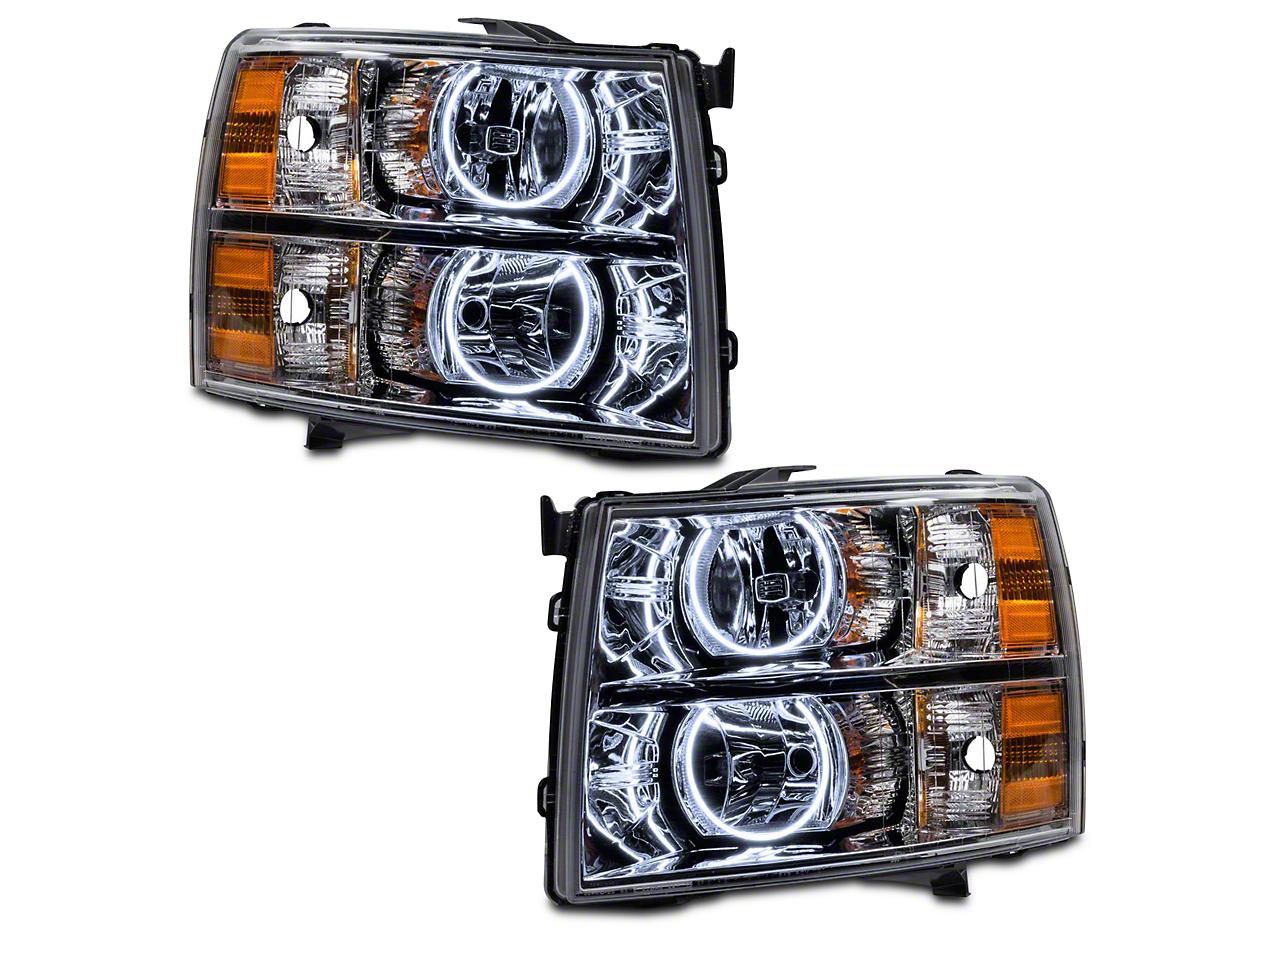 Chrome OE Style Headlights w/ Round Ring CCFL Halos (07-13 Silverado 1500)